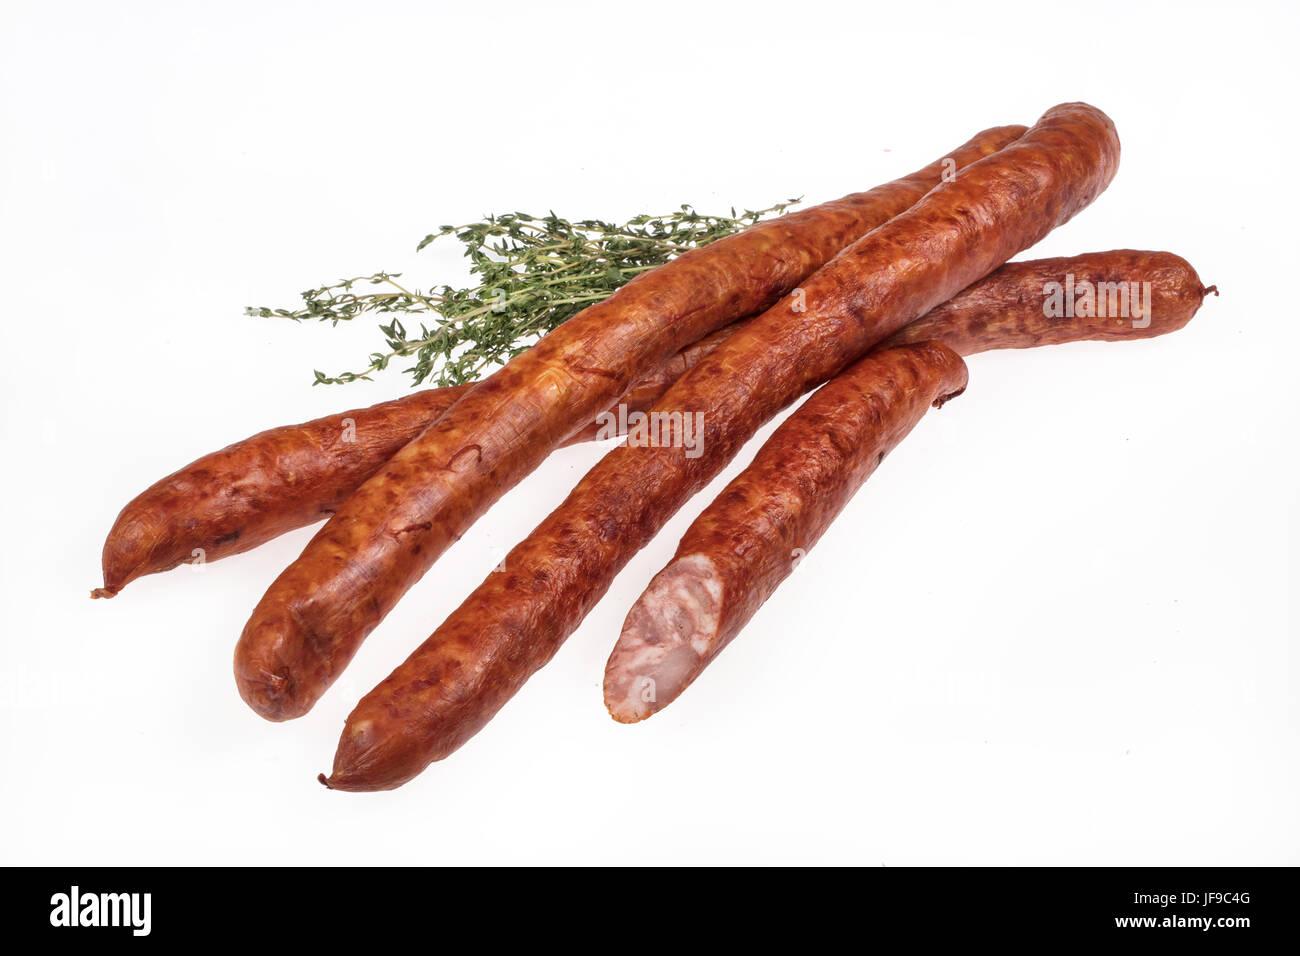 Sausage With Greenery - Stock Image